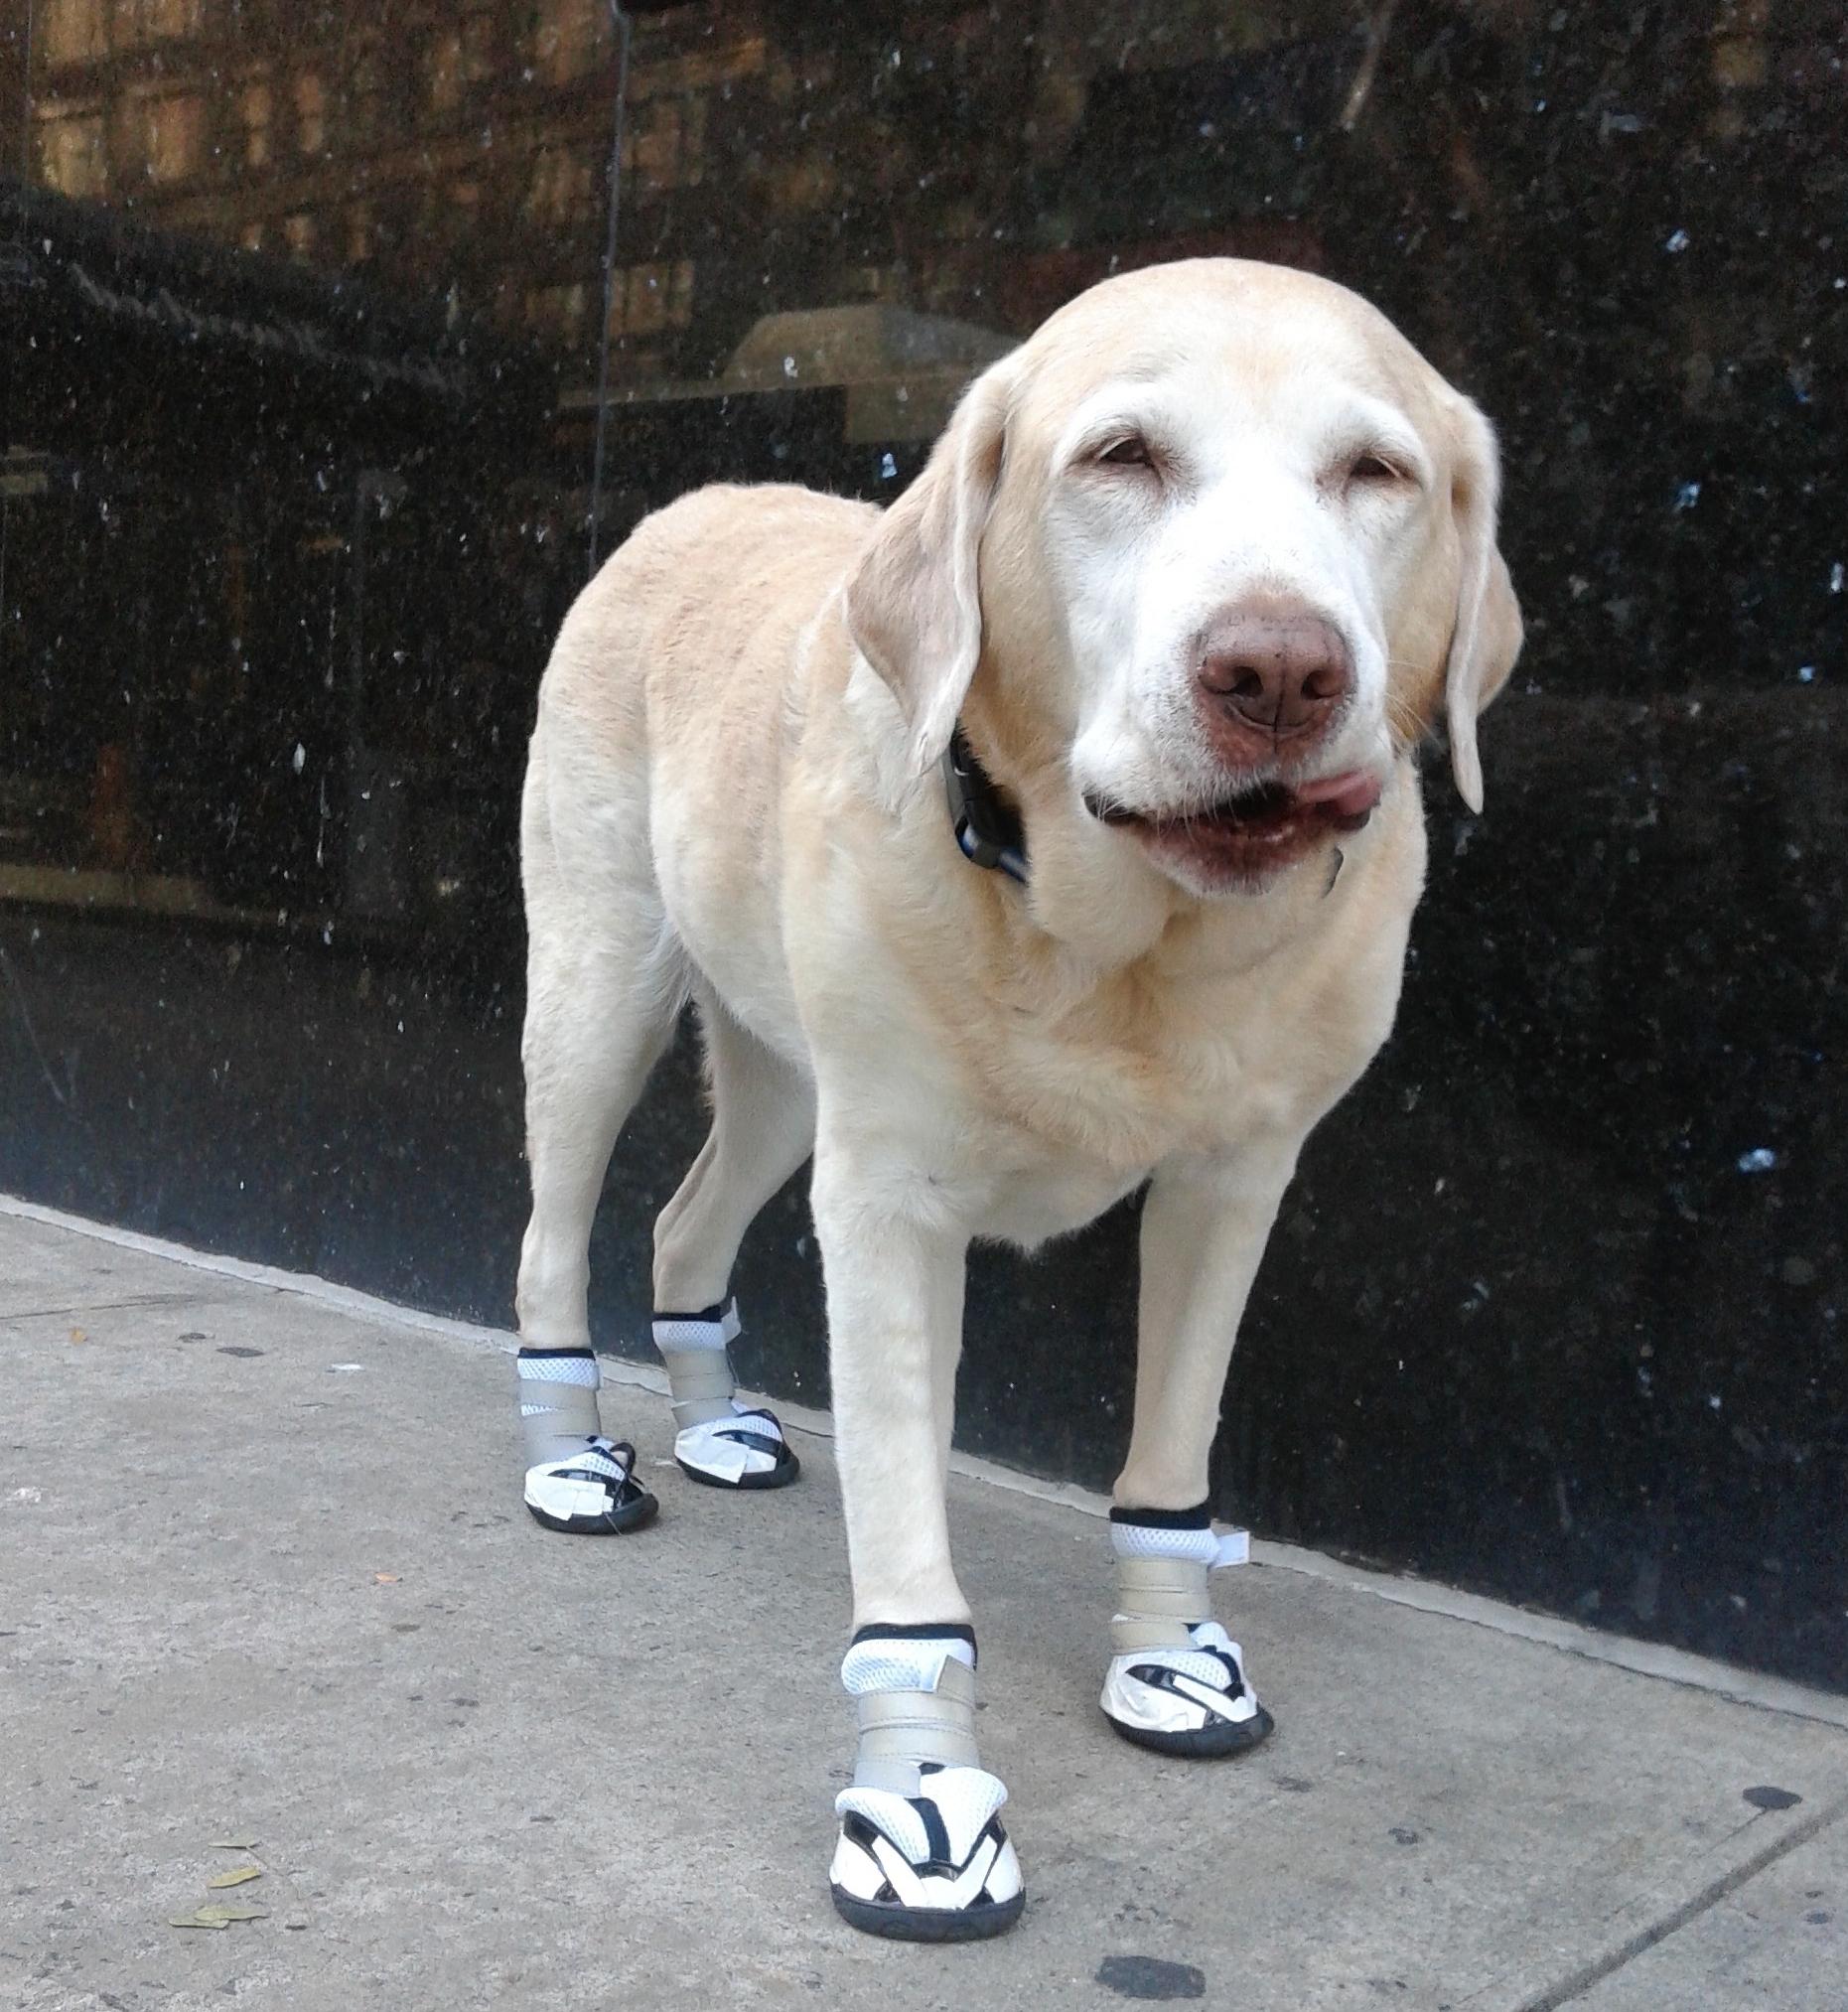 Orthopedic & Non Slip Shoes For Injuries, Arthritis